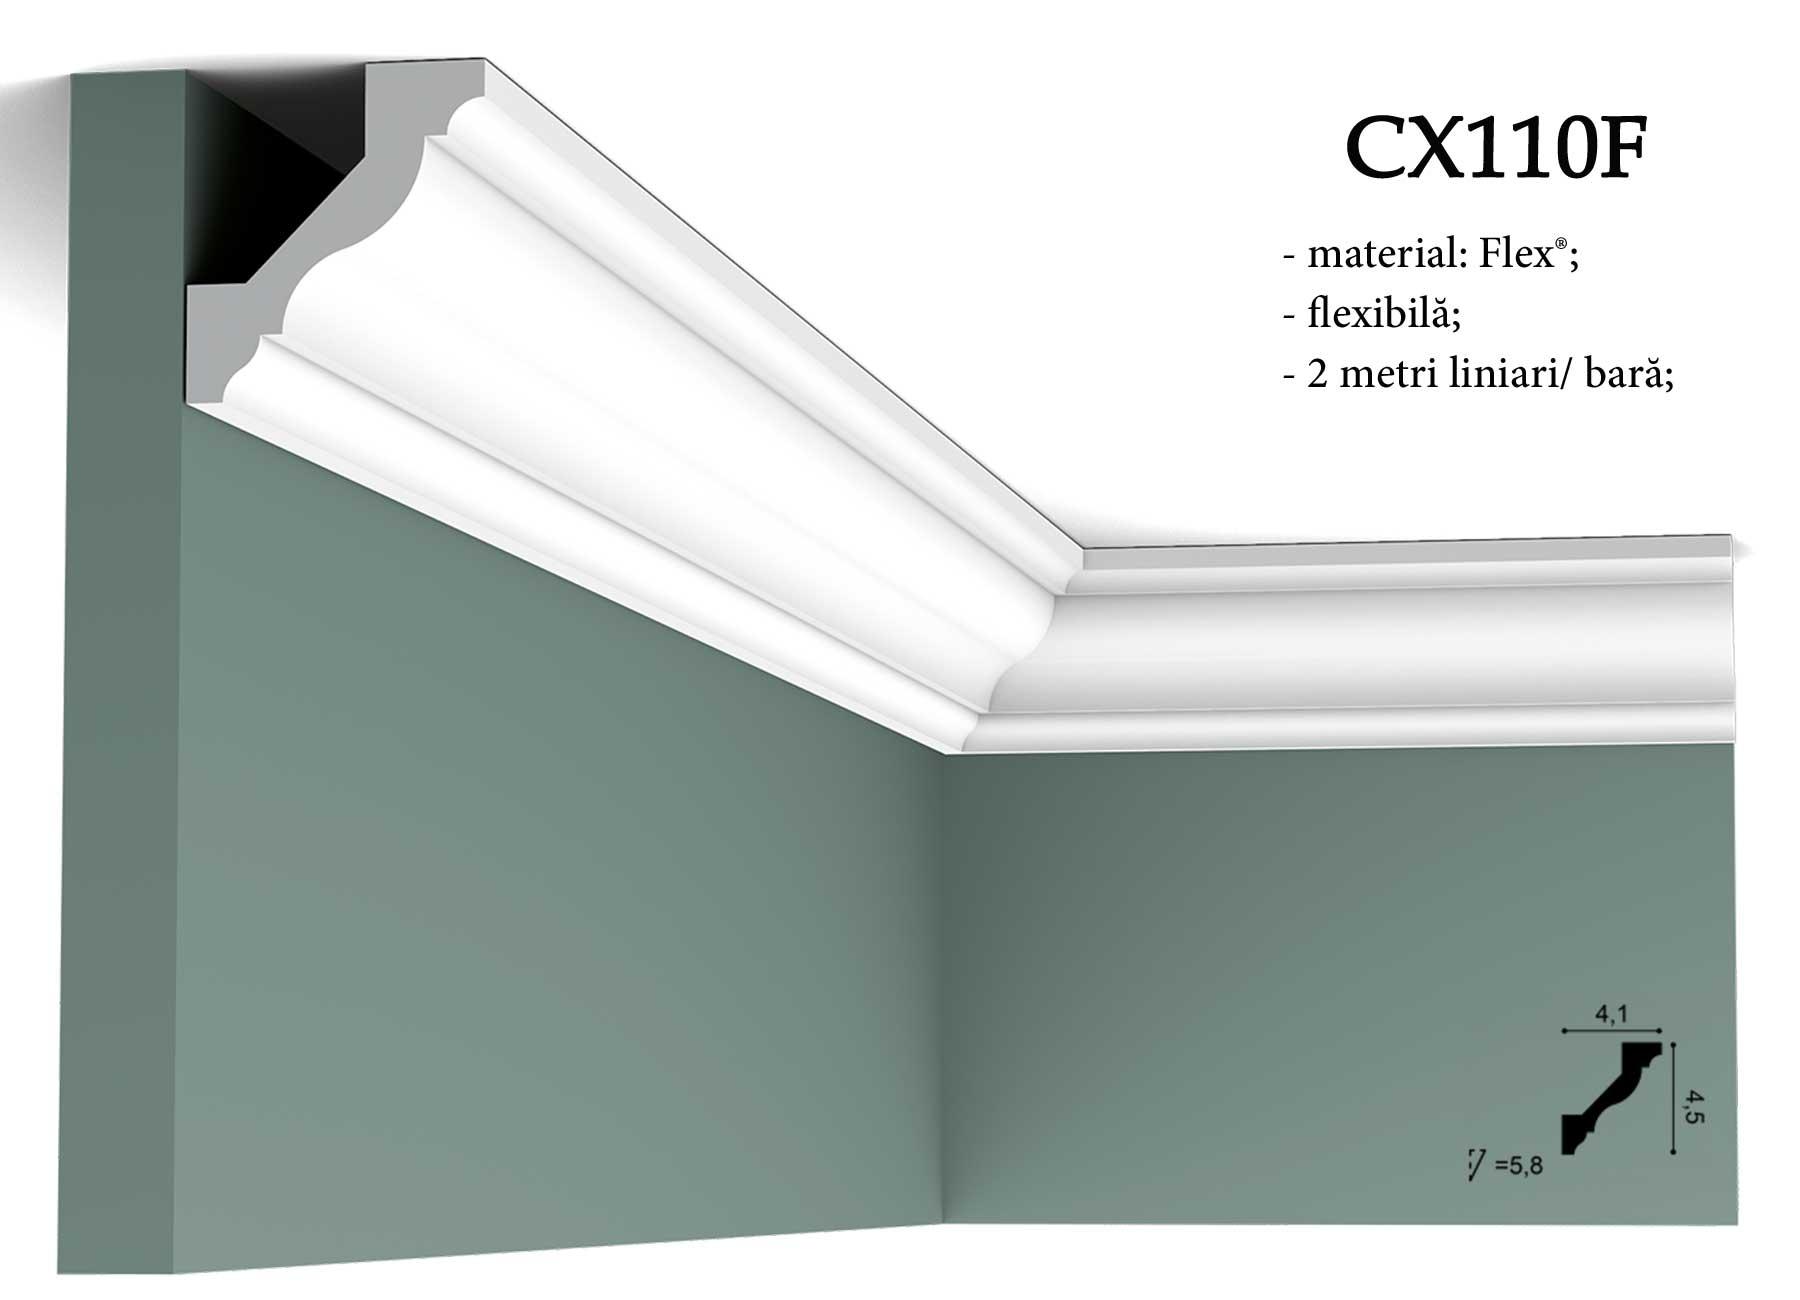 Cornisa decorativa flexibila pentru tavan CX110F Orac Decor. erminatie tapet.